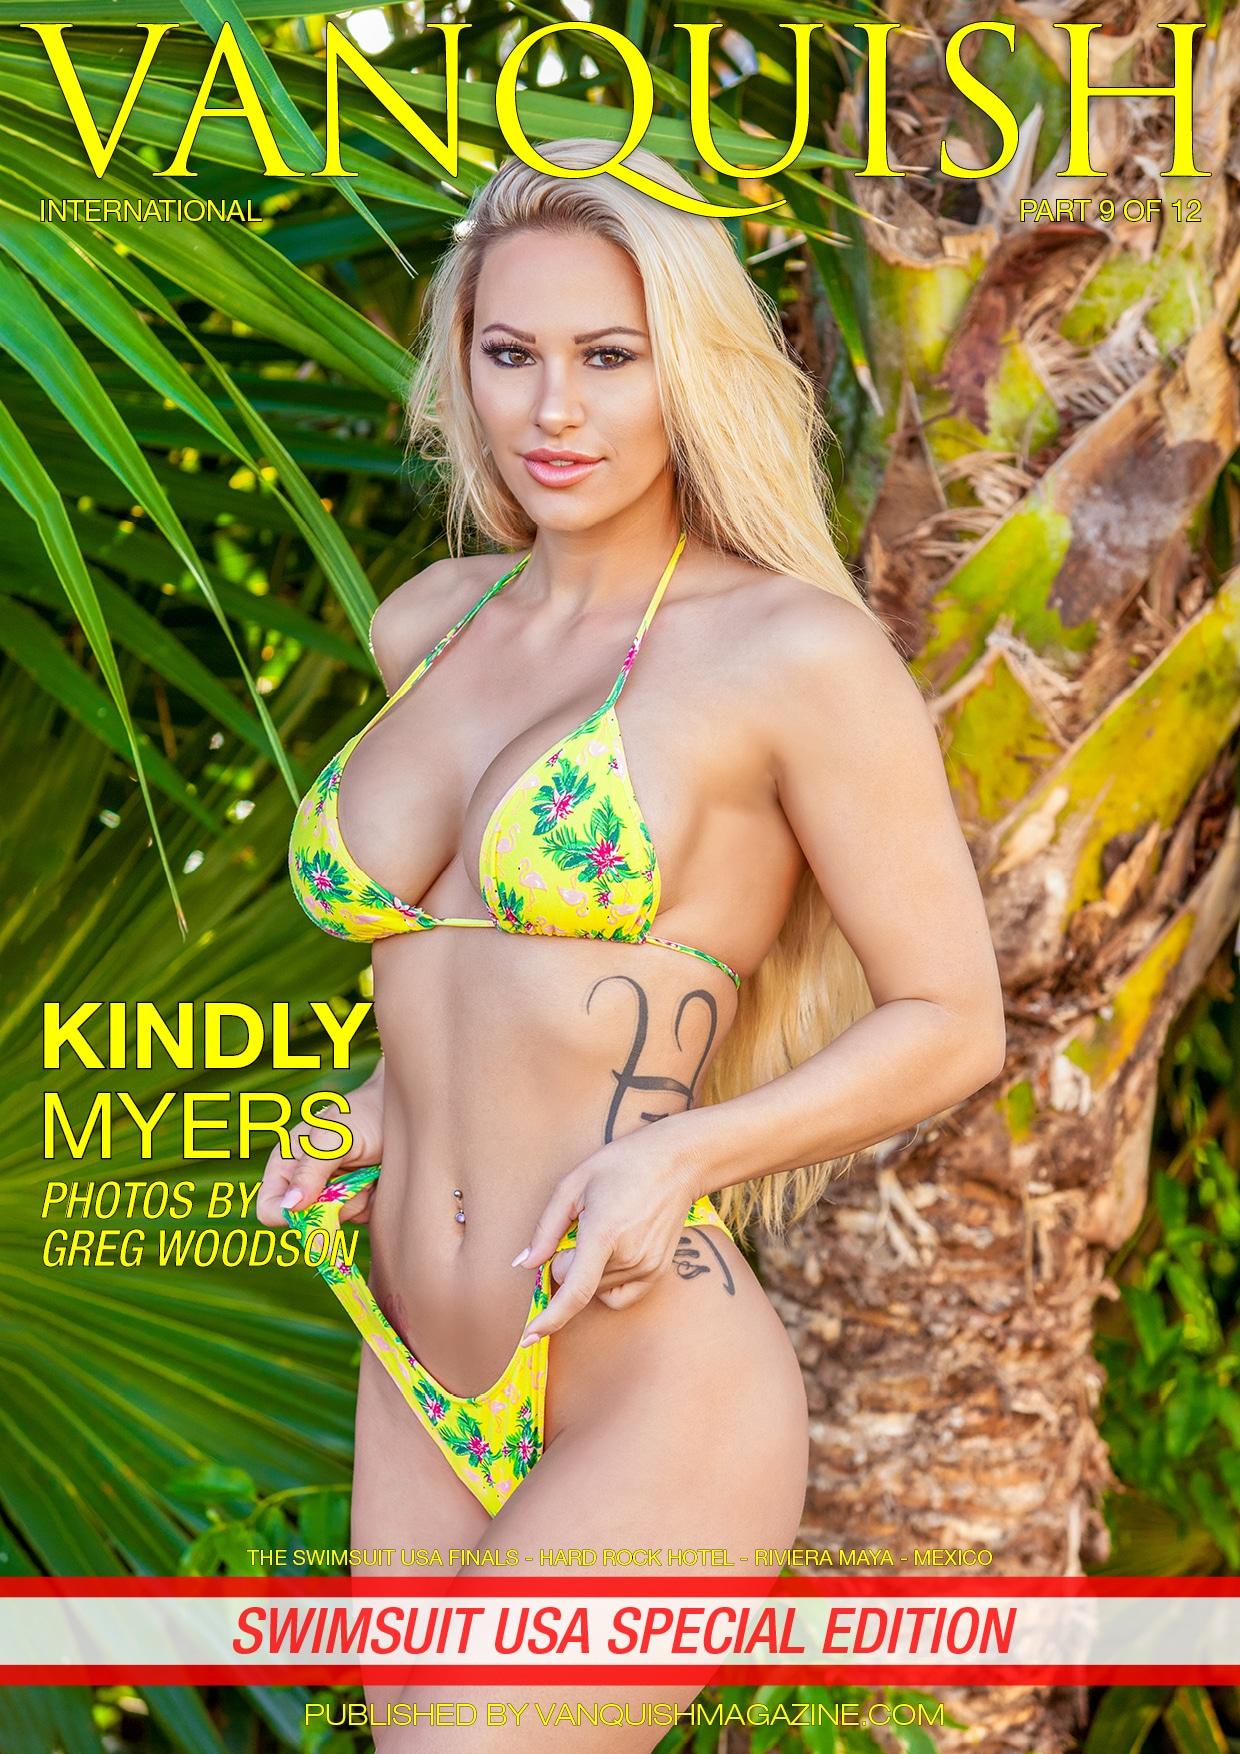 Vanquish Magazine - Swimsuit USA 2018 - Part 9 - Kindly Myers 1